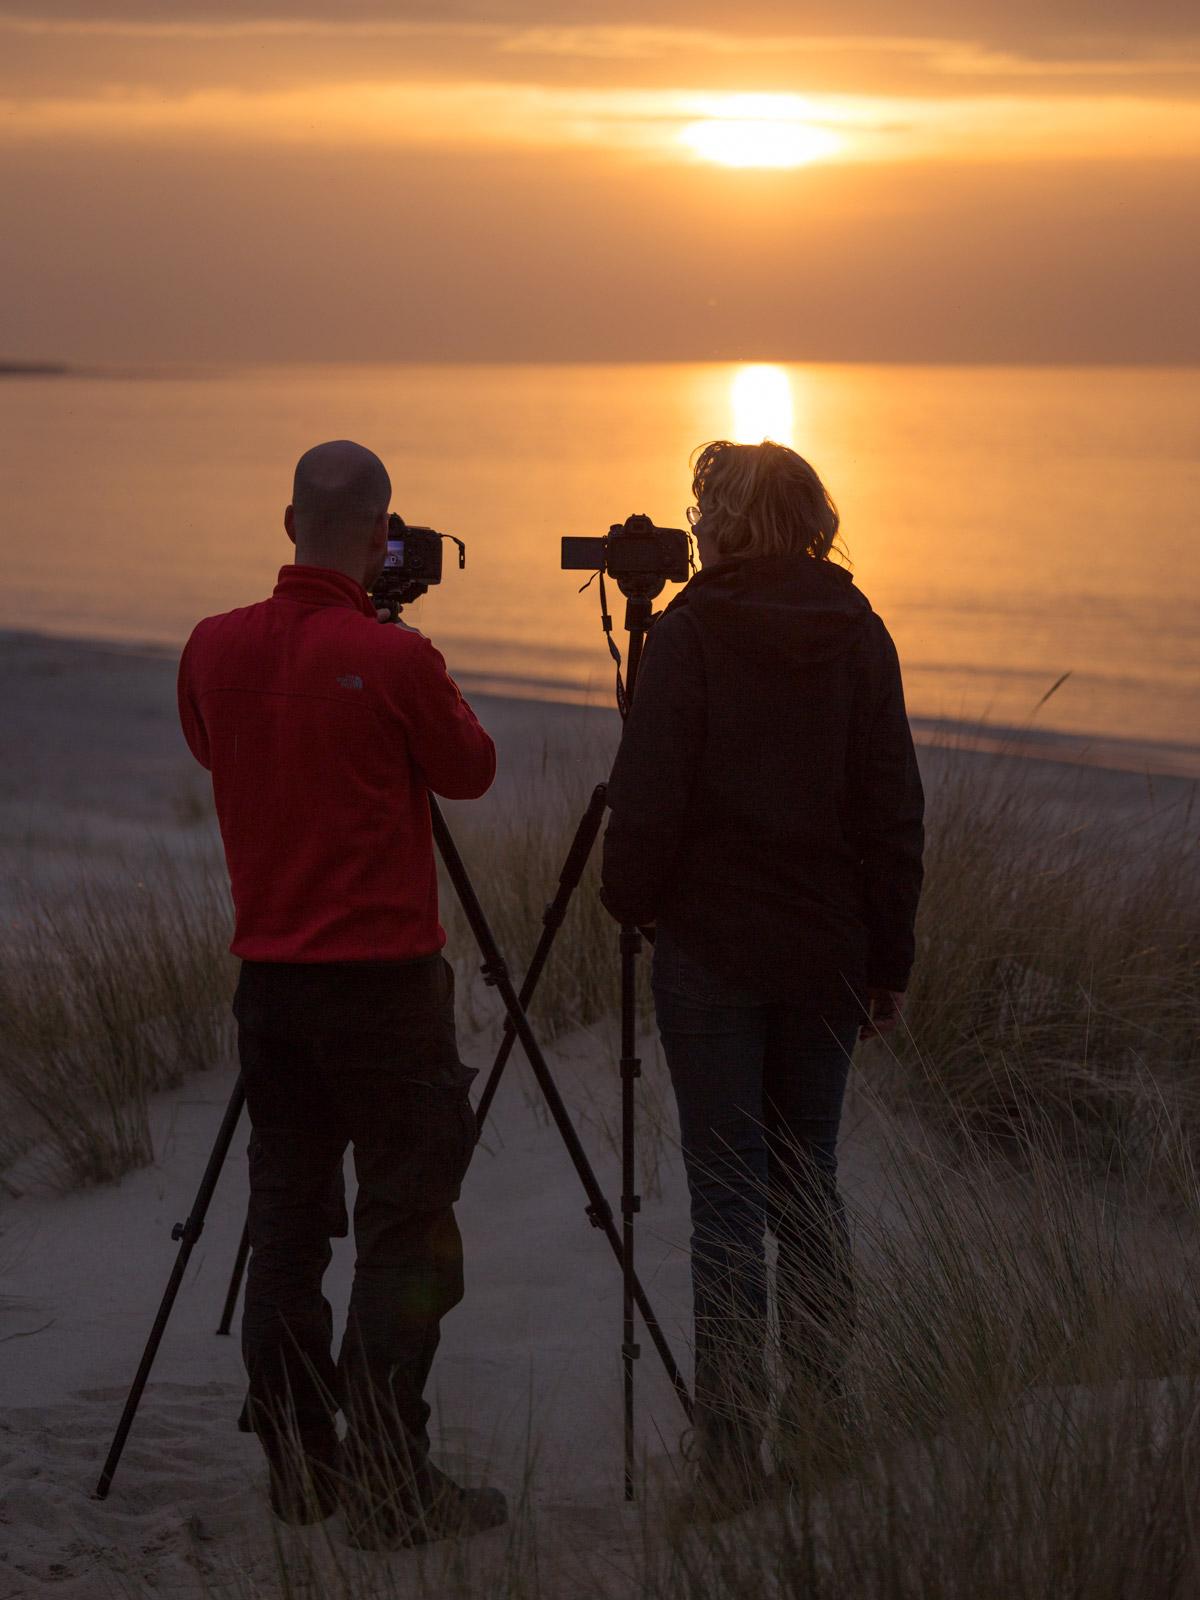 Fotografie Workshops - Dion van den Boom - Fotografie - © Tom Opdebeeck